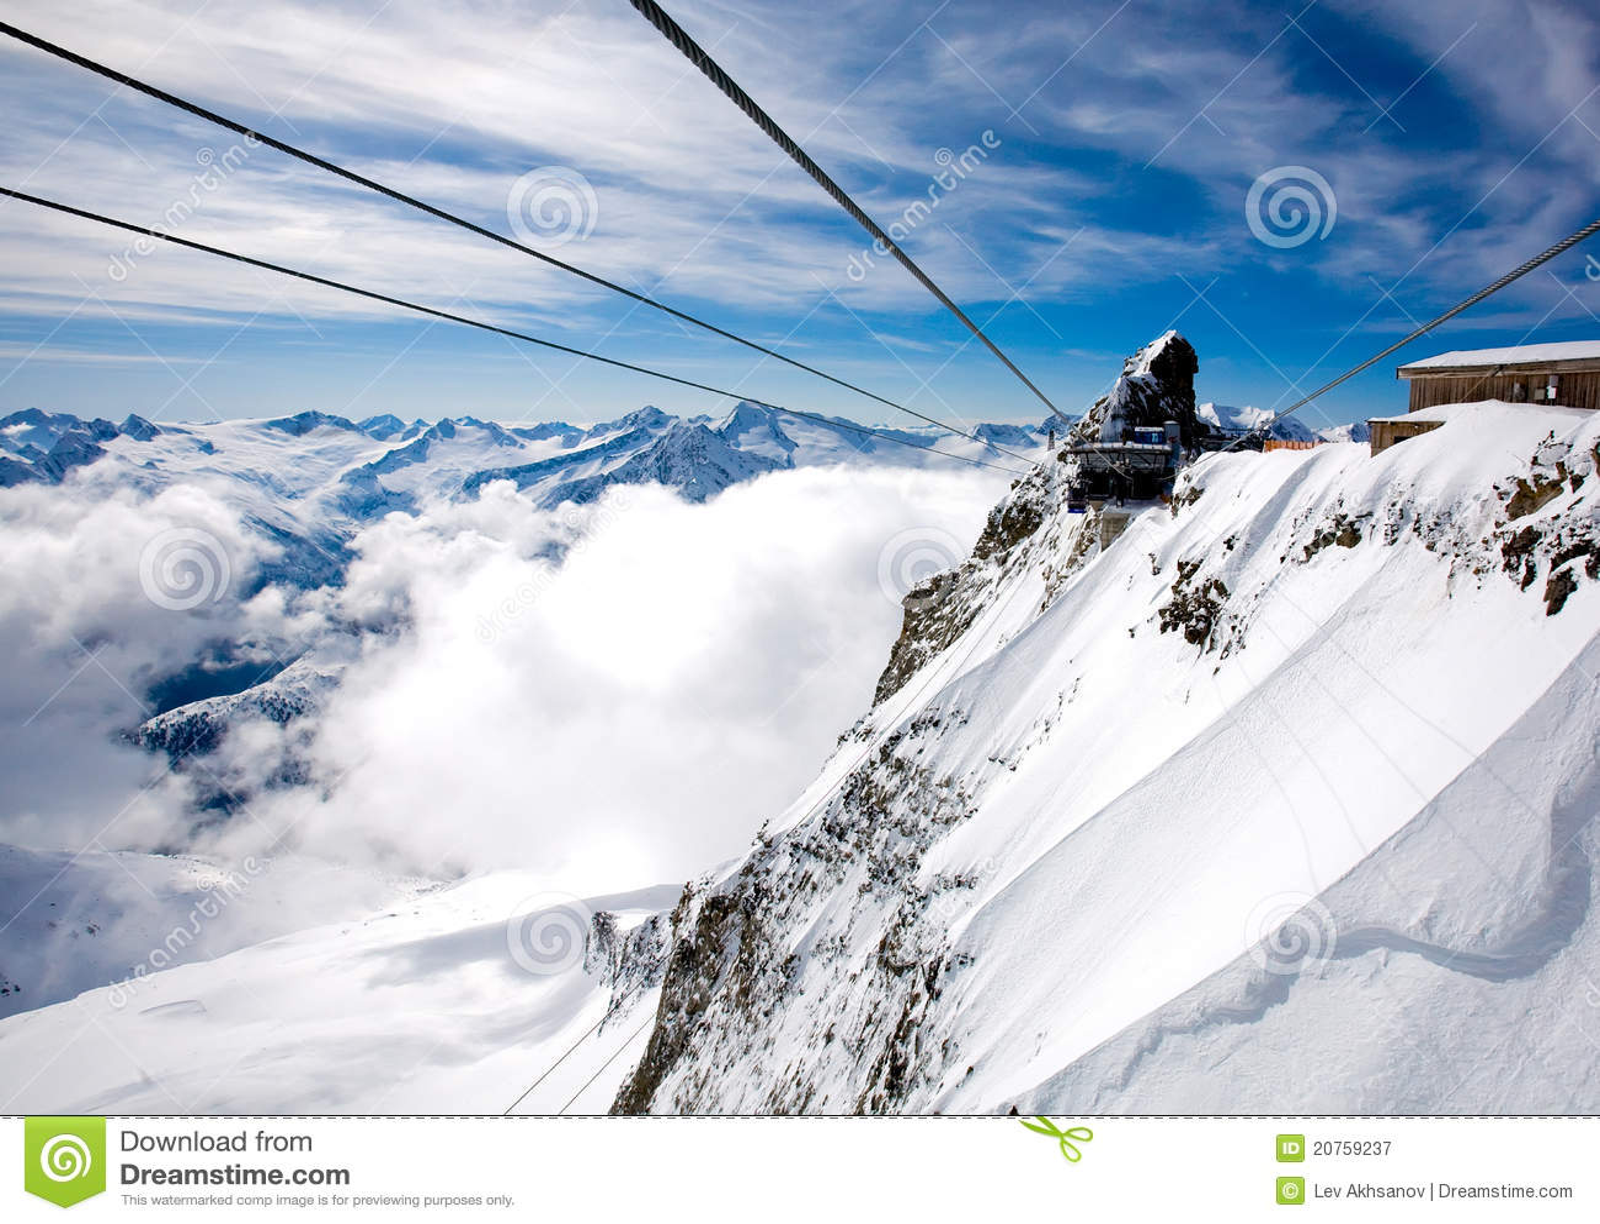 Hintertux Glacier Austria  City new picture : Cables and gandola station at Hintertux Glacier in Zillertal, Austria.